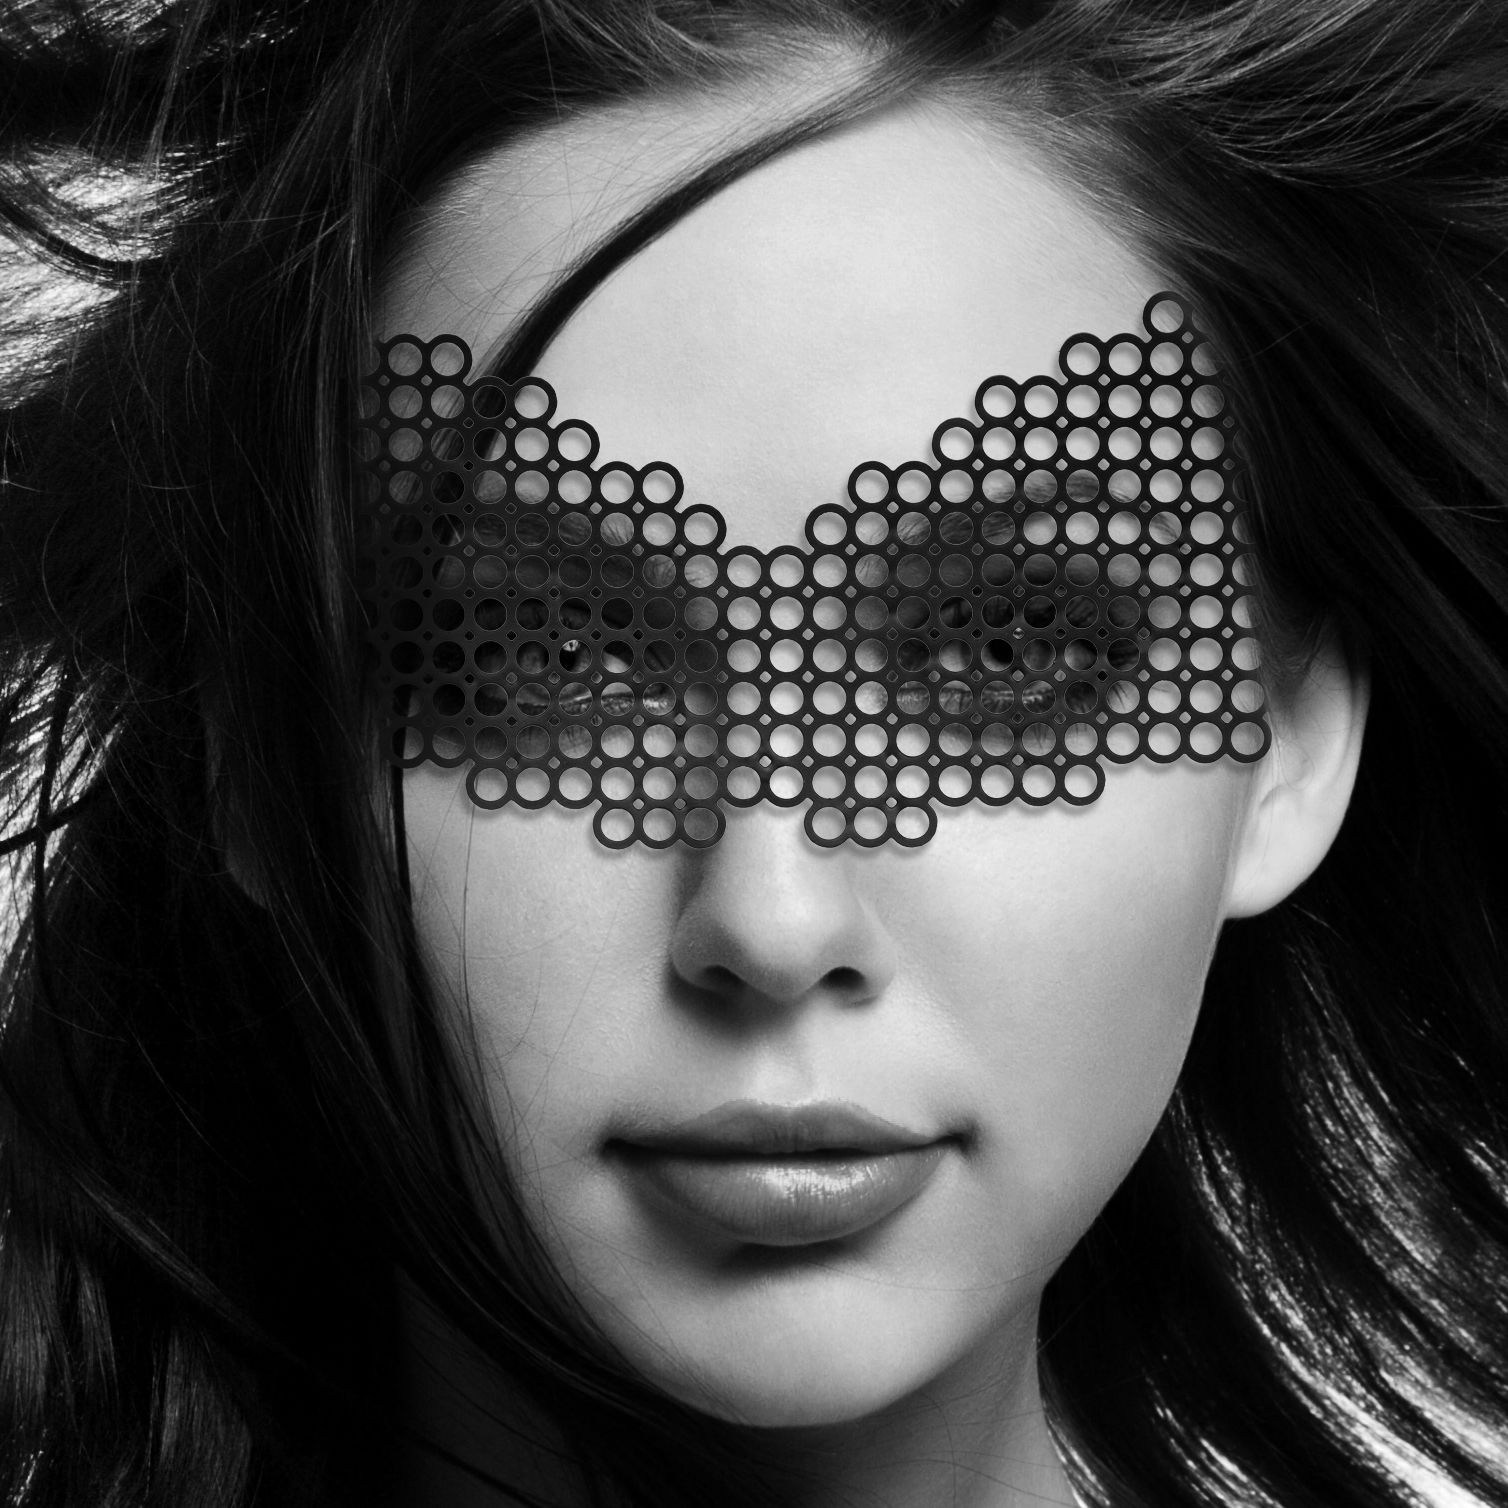 Маска для БДСМ - Маска Bijoux Indiscrets - Erika Mask 1